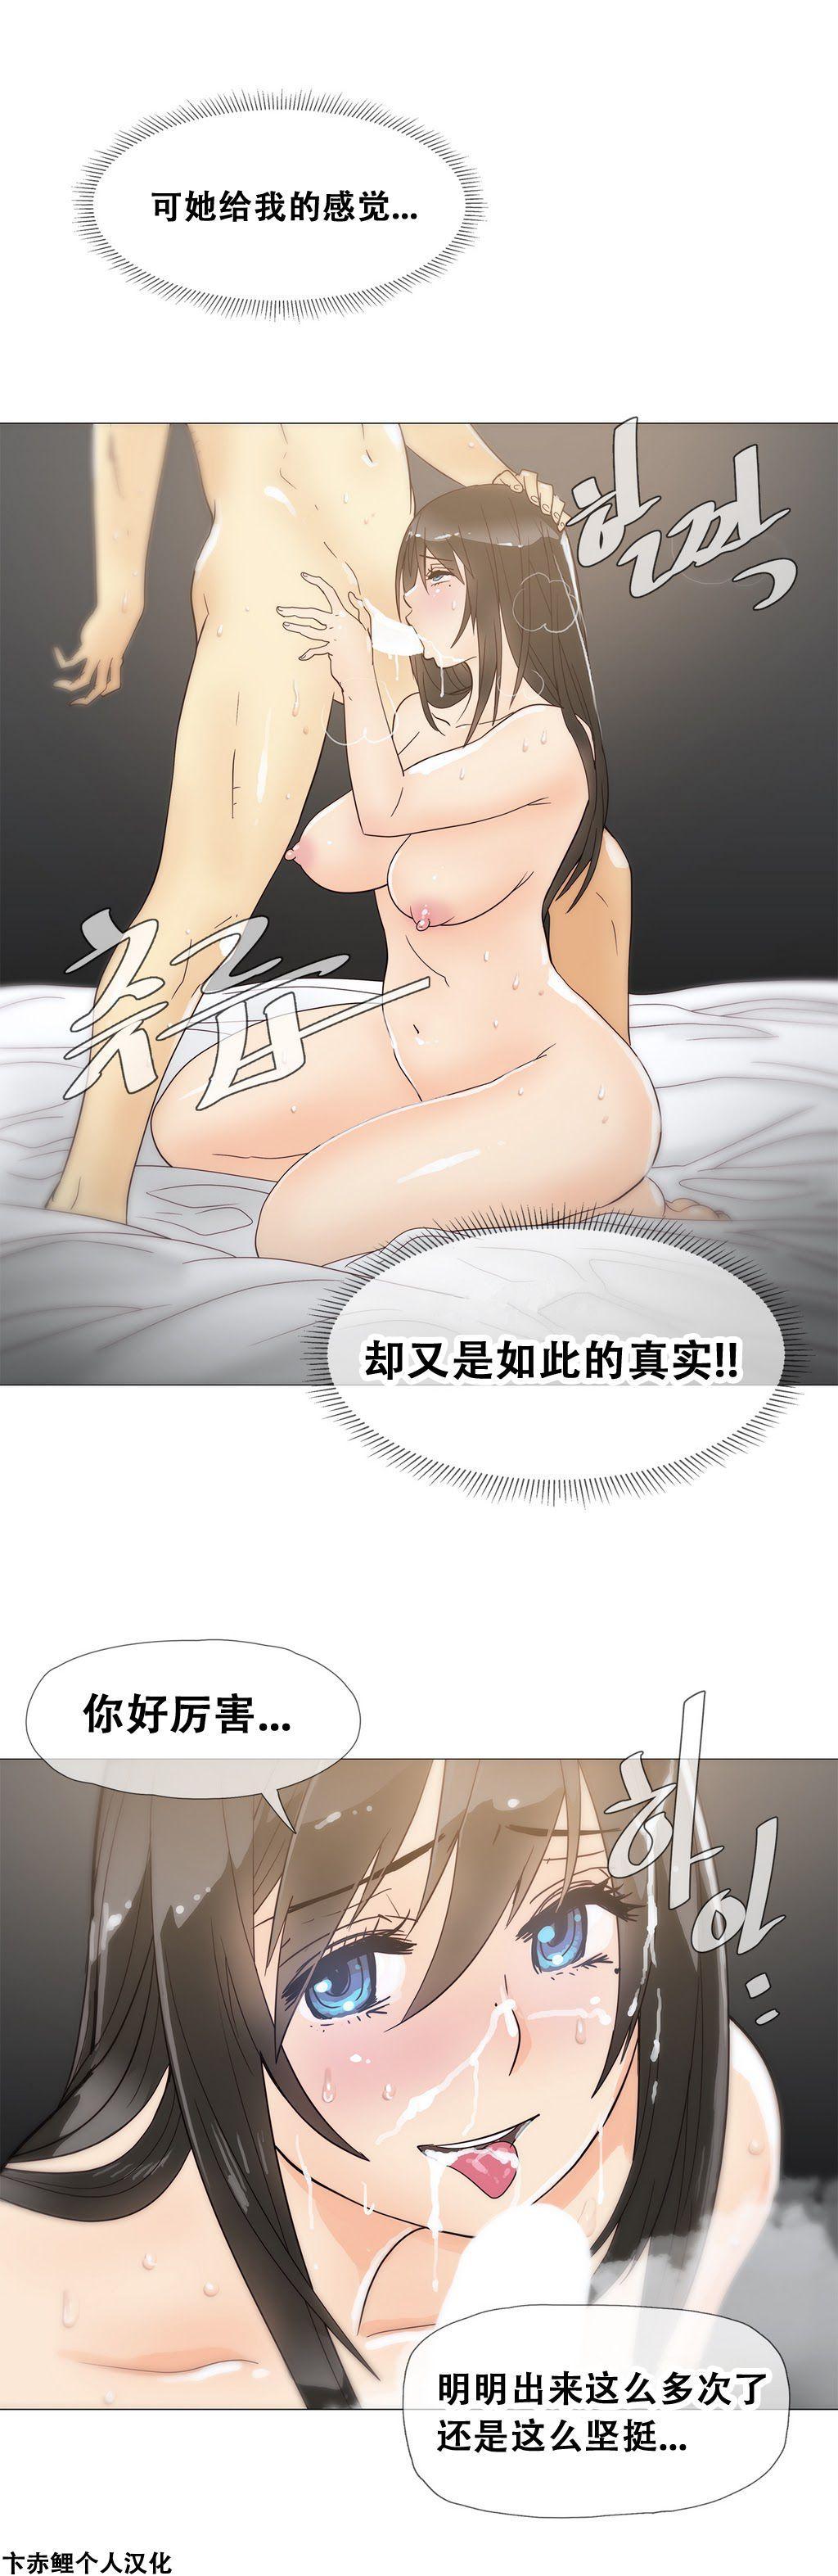 HouseHold Affairs 【卞赤鲤汉化】1~15话 290